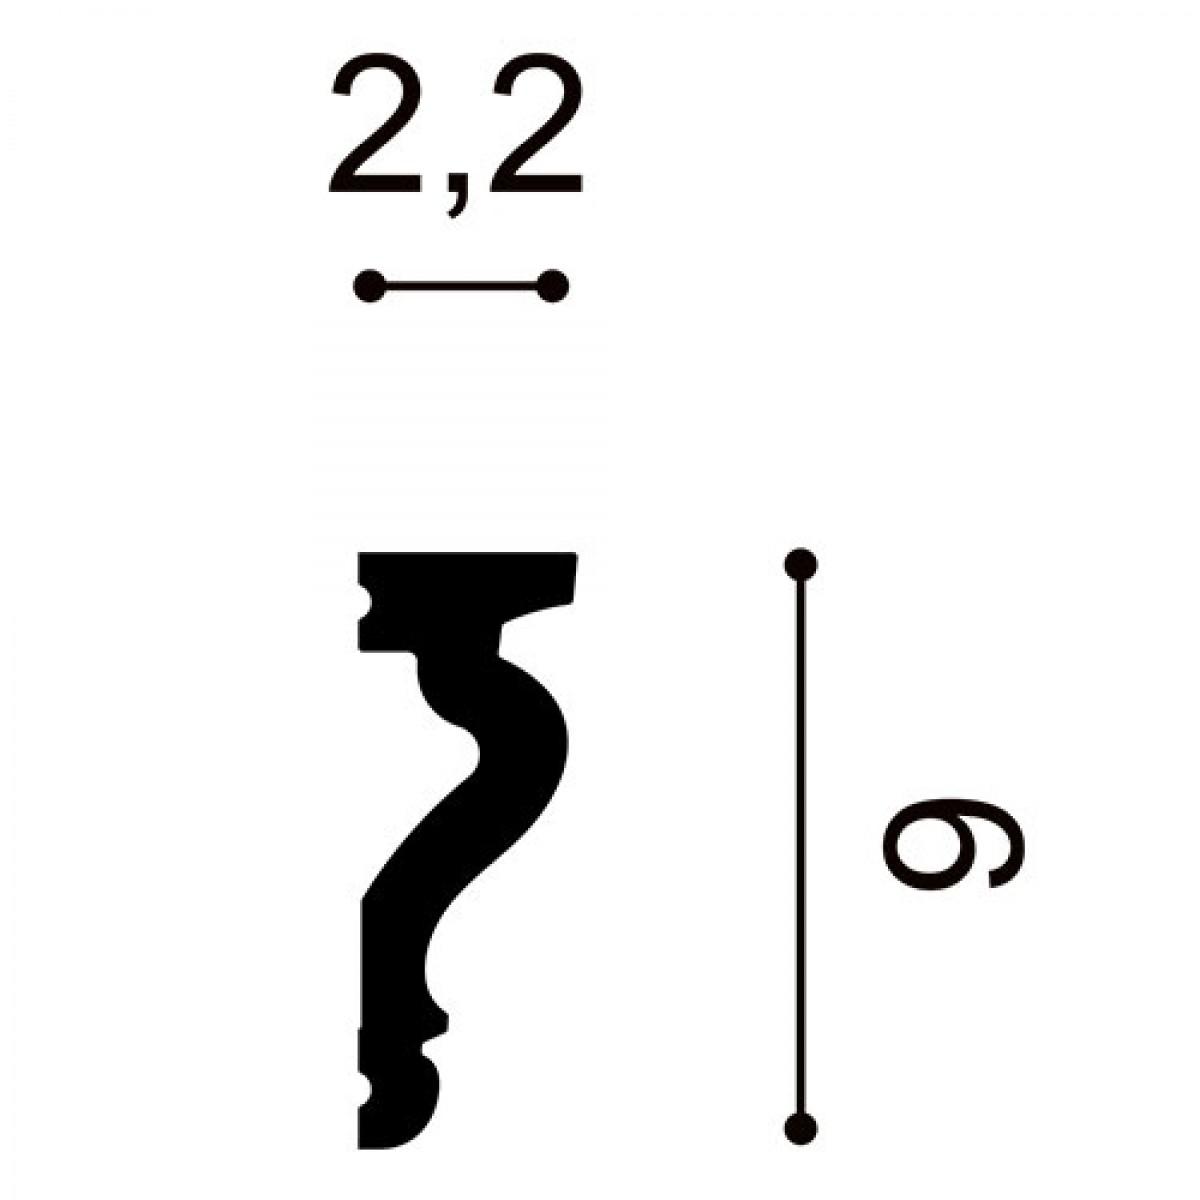 Ancadrament Usa Luxxus DX174-2300, Dimensiuni: 230 X 2.2 X 6 cm, Orac Decor